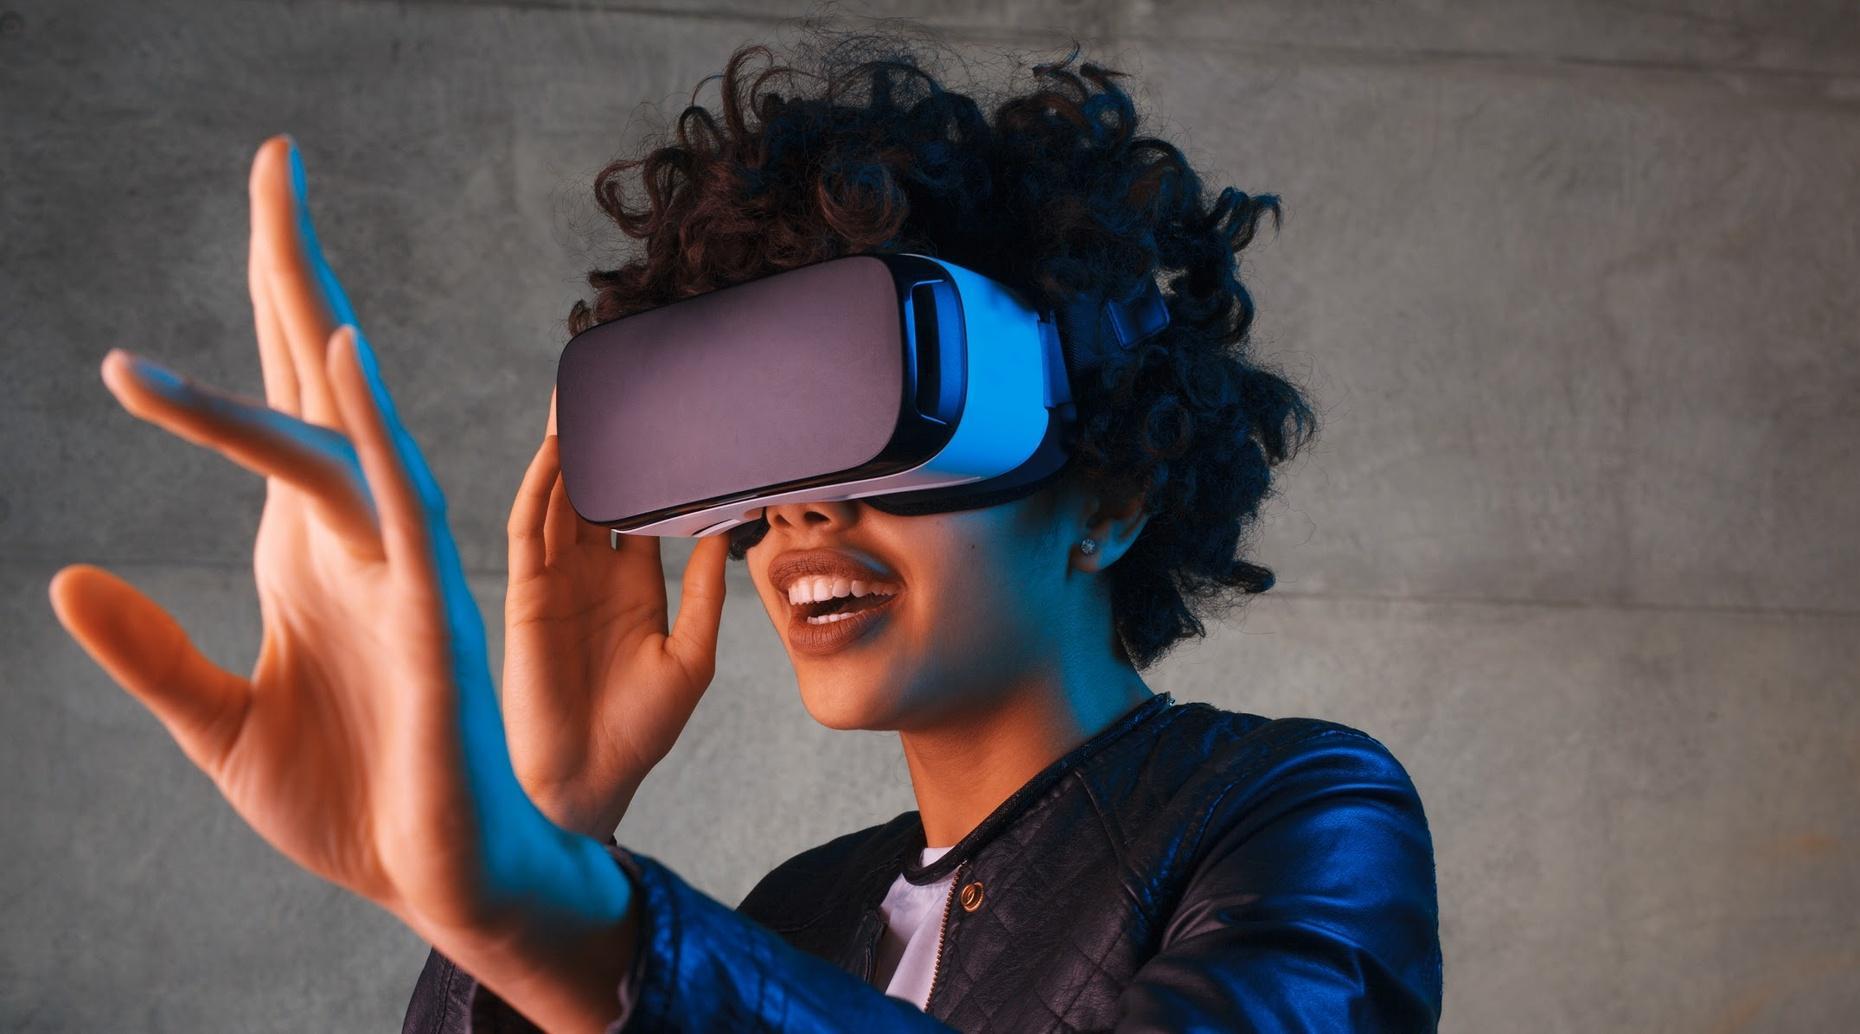 30-Minute Virtual Reality Headset Rental